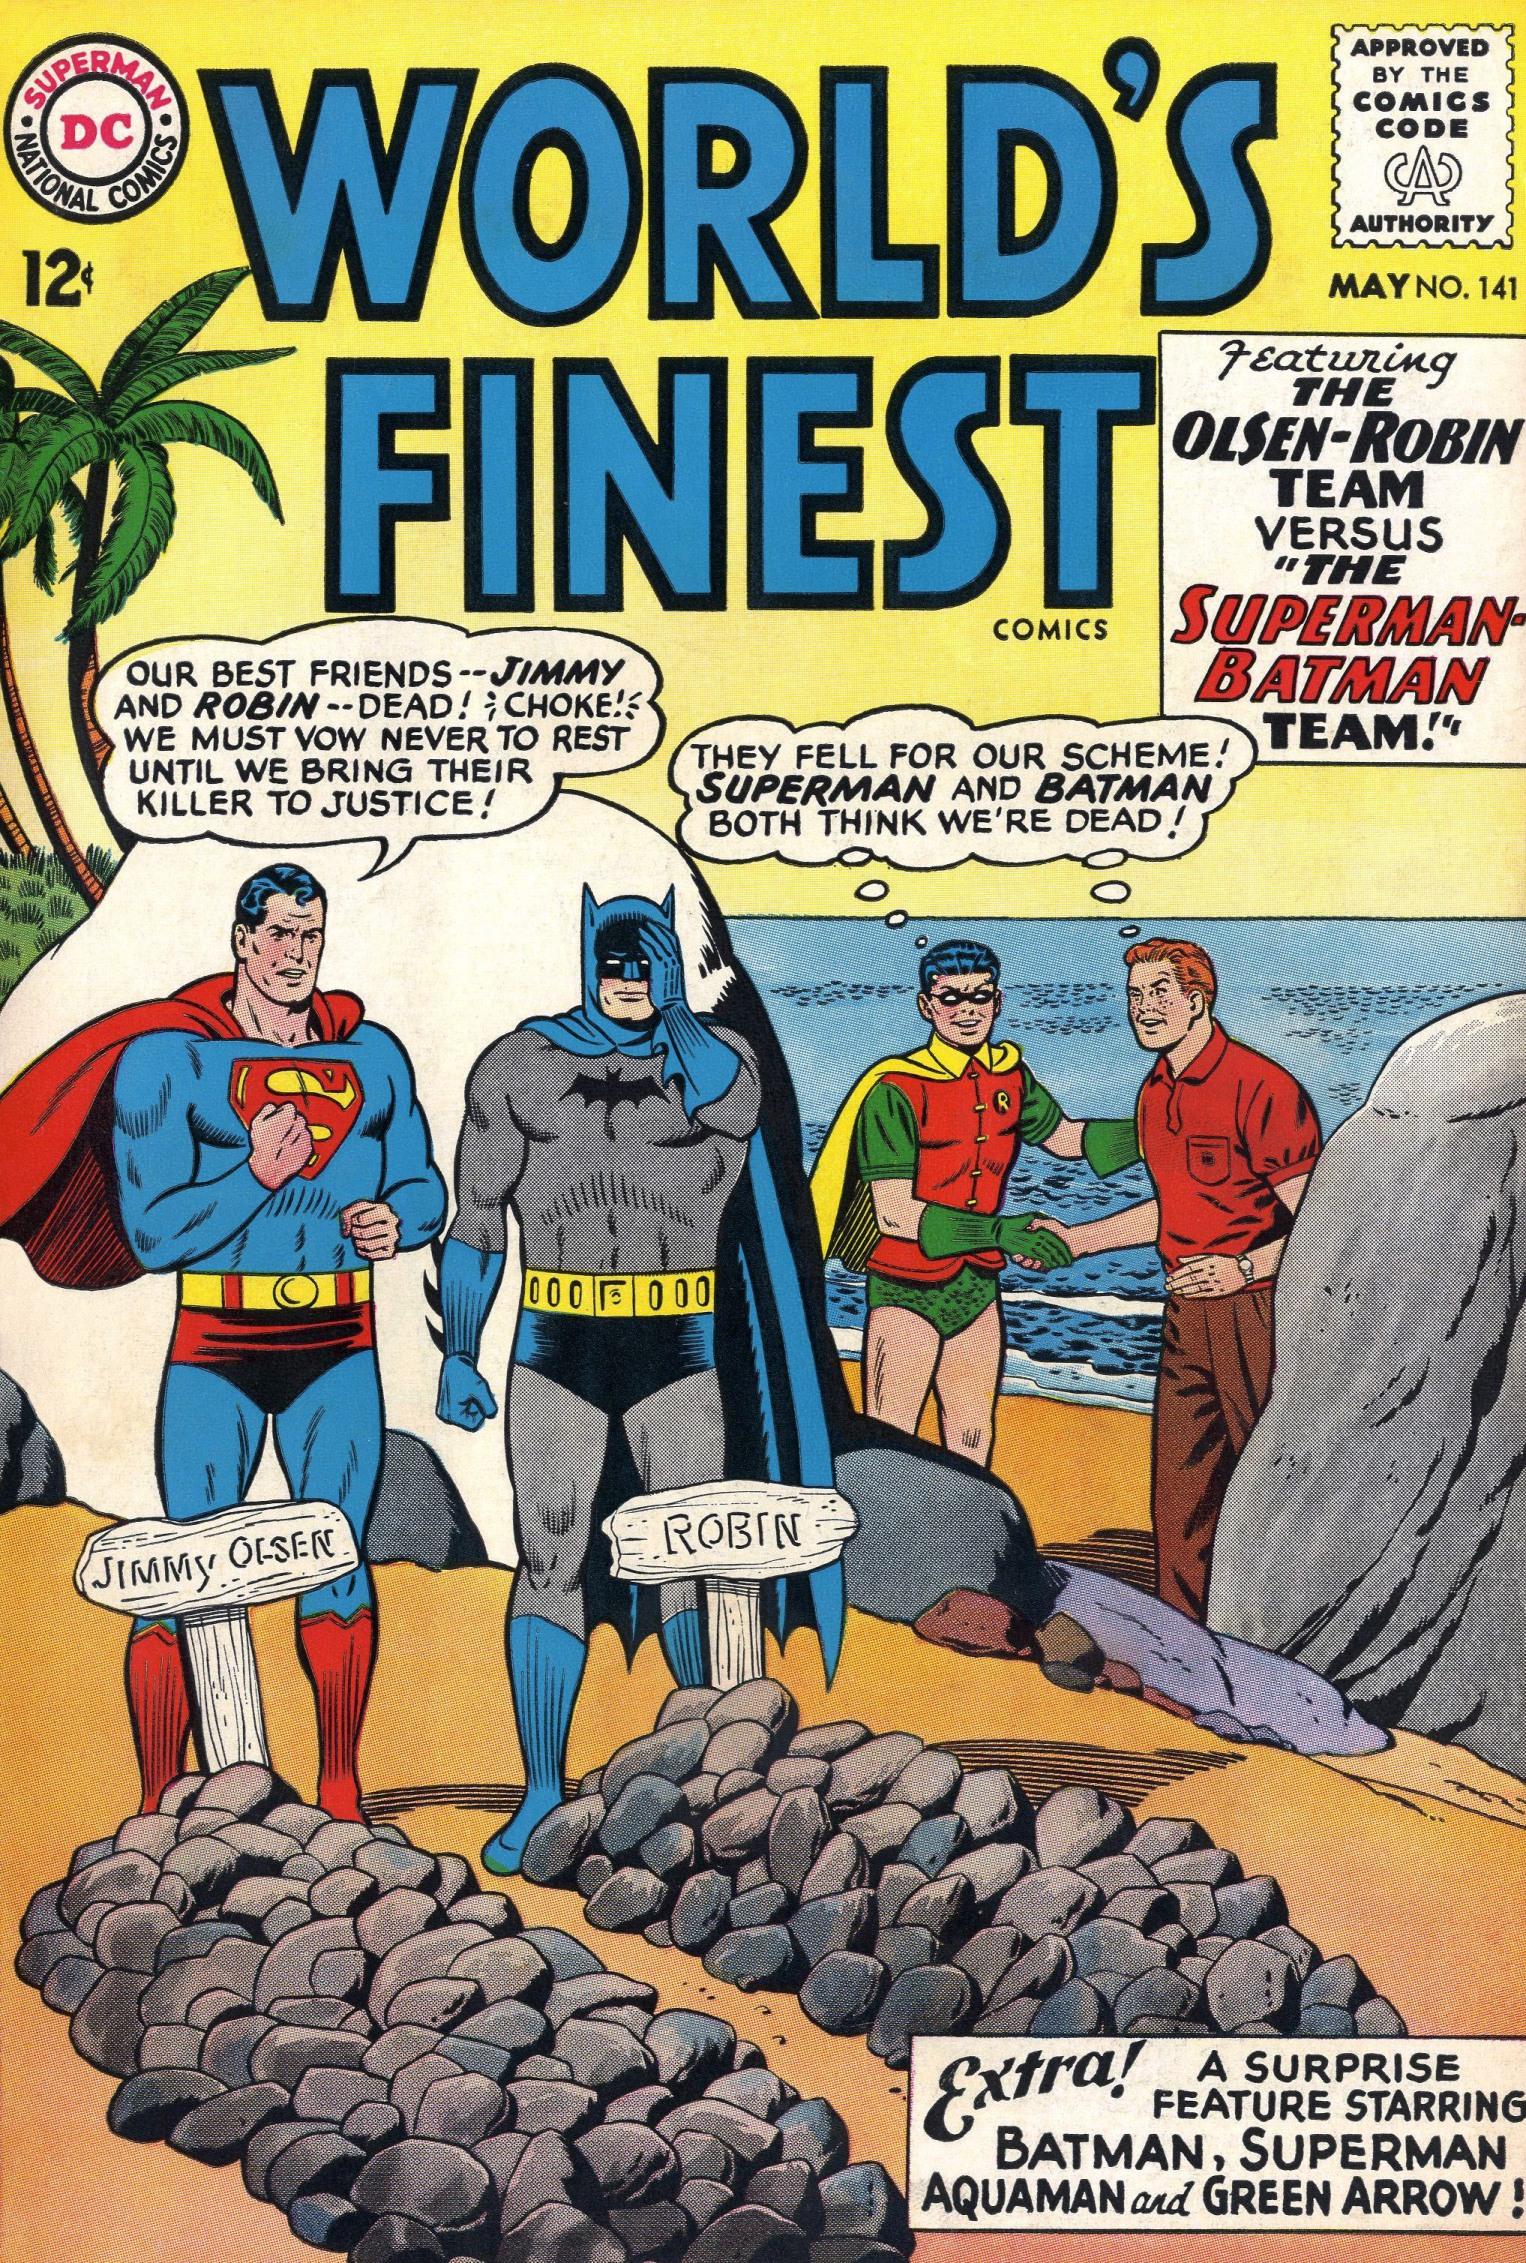 Read online World's Finest Comics comic -  Issue #141 - 1